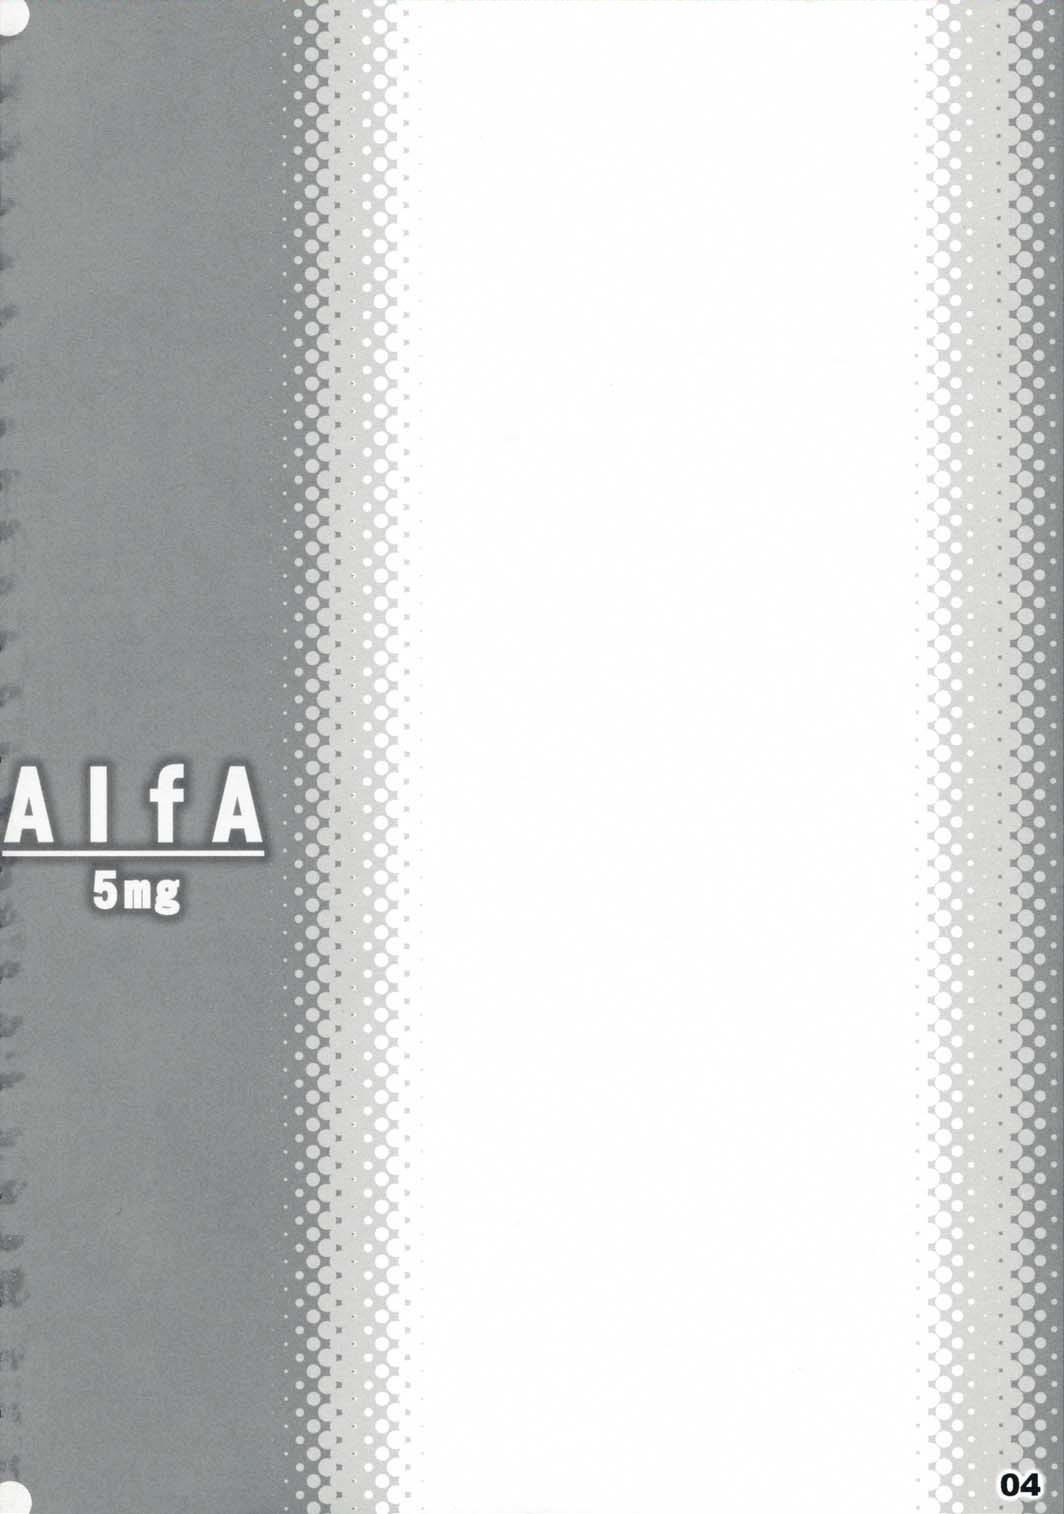 AlfA 5mg 2